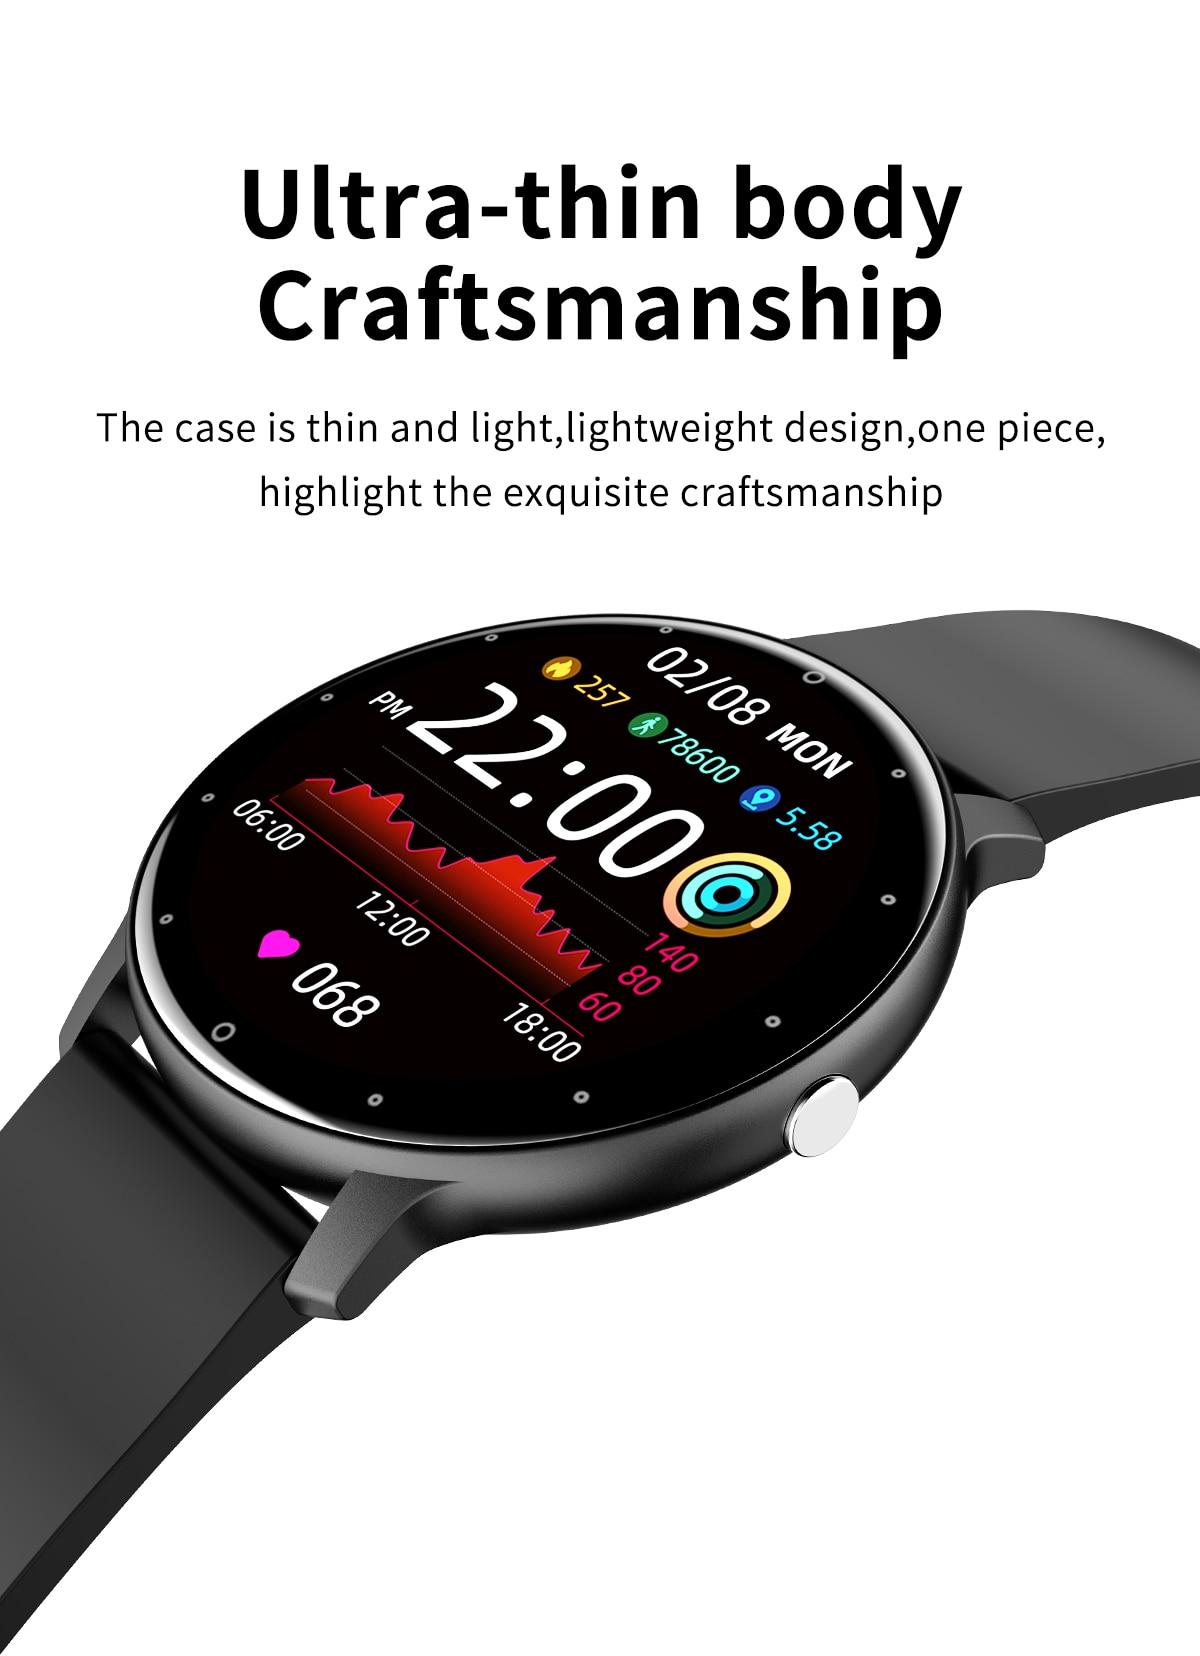 He1c4fa3a84c448dfb4cd593e6905f49dQ LIGE 2021 Fashion Smart Watch Men Fitness Bracelet Heart Rate Blood Pressure Monitoring Sports Tracker Smartwatch Gift for Women